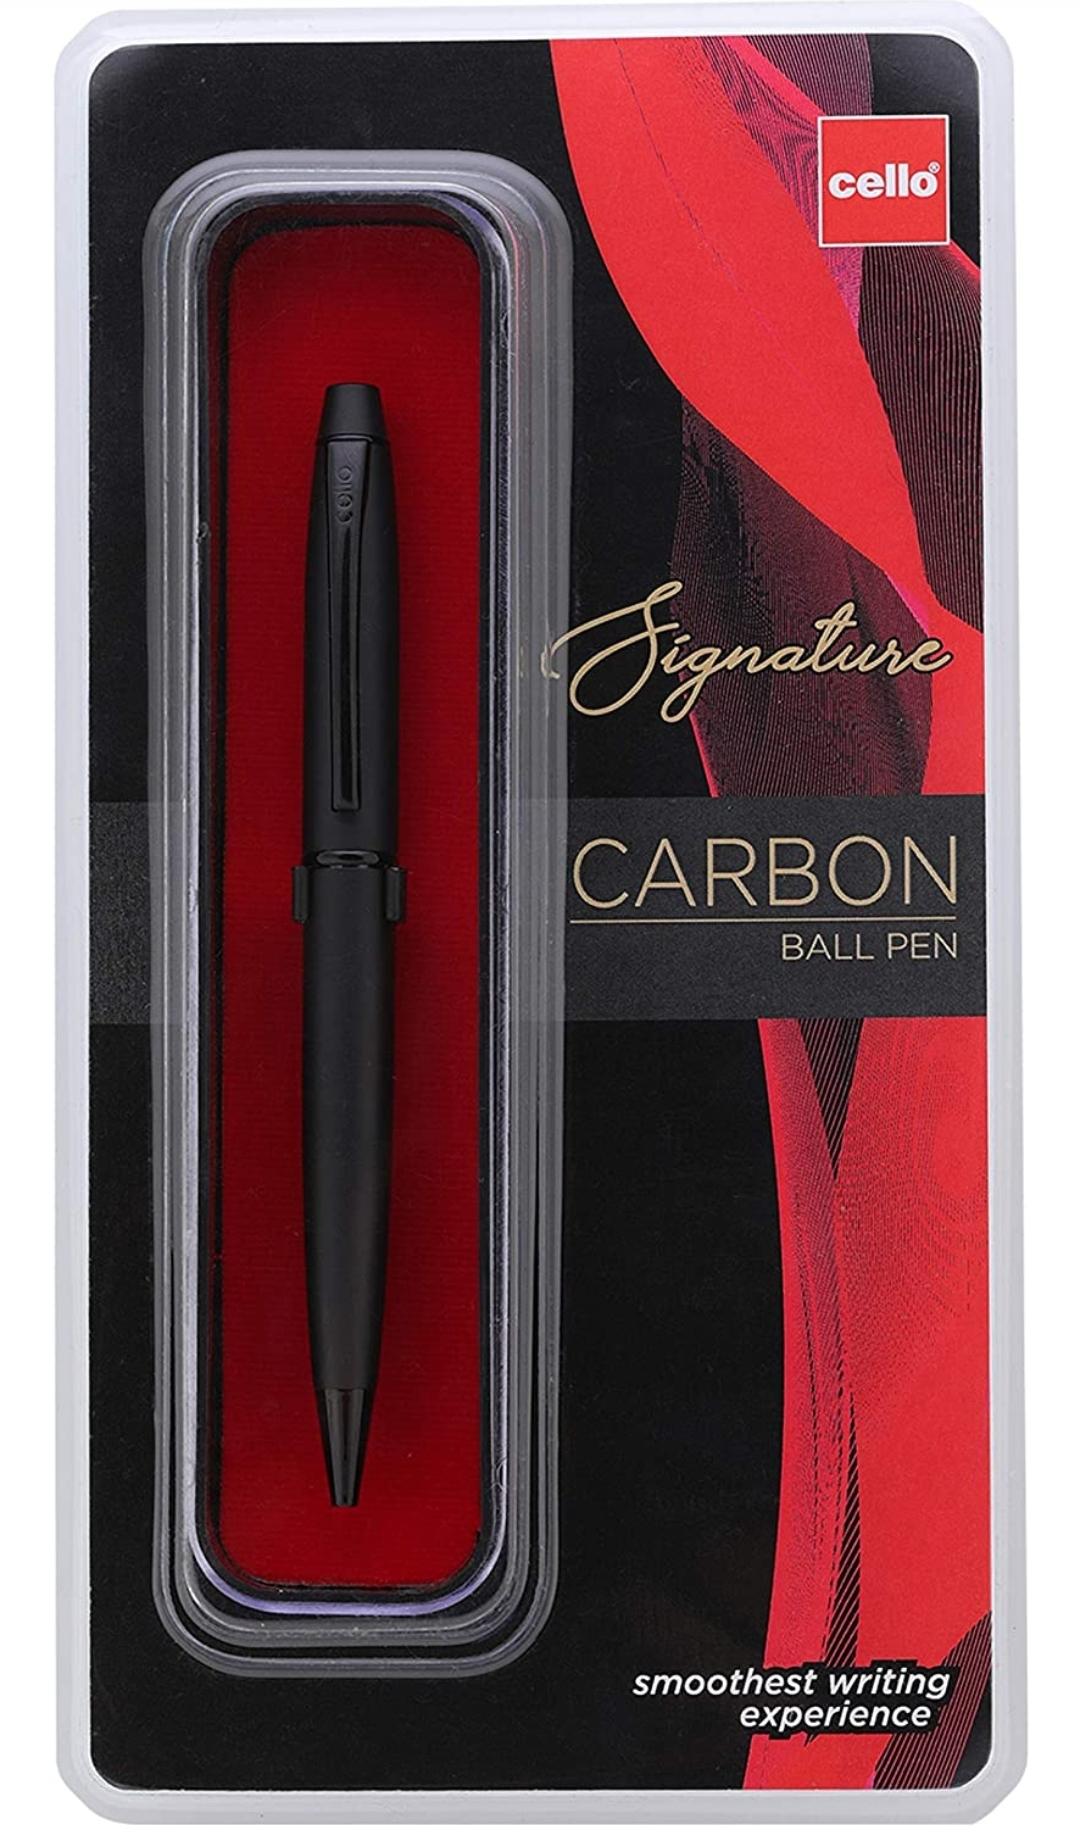 Cello Signature Carbon Ball Pen Blue Pen 0.7 mm Gift Pack of 1 Pen